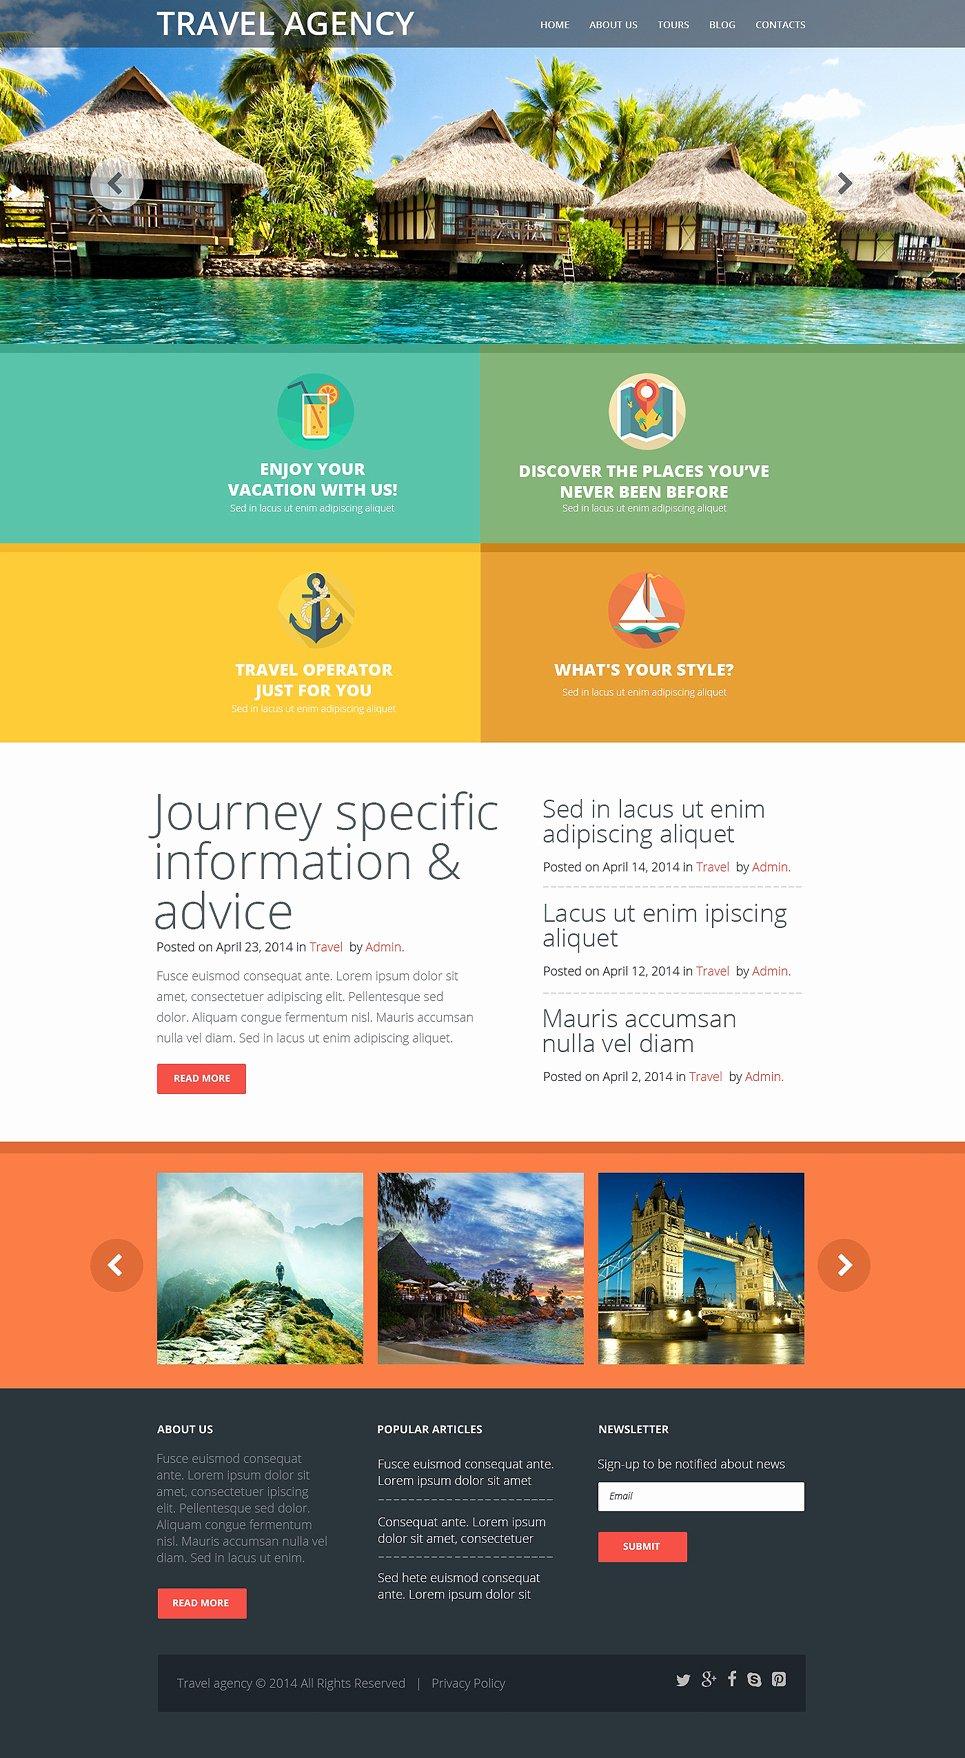 Travel Agent Website Template Unique Travel Agency Responsive Website Template